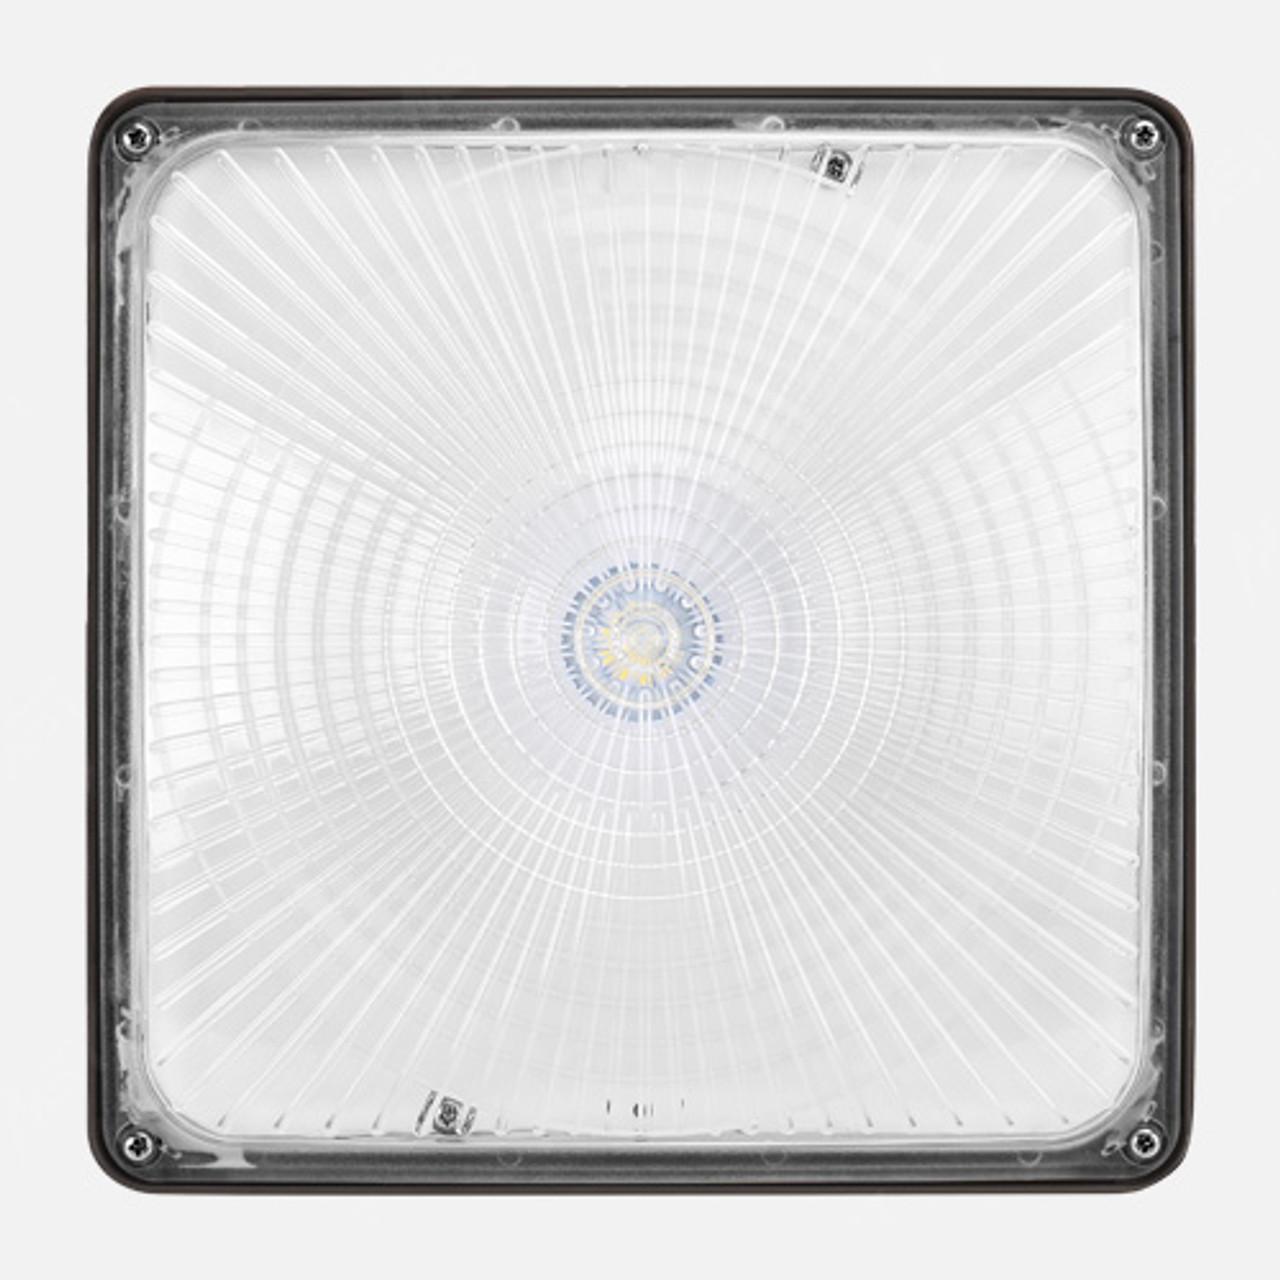 27 Watt LED Canopy Light Front